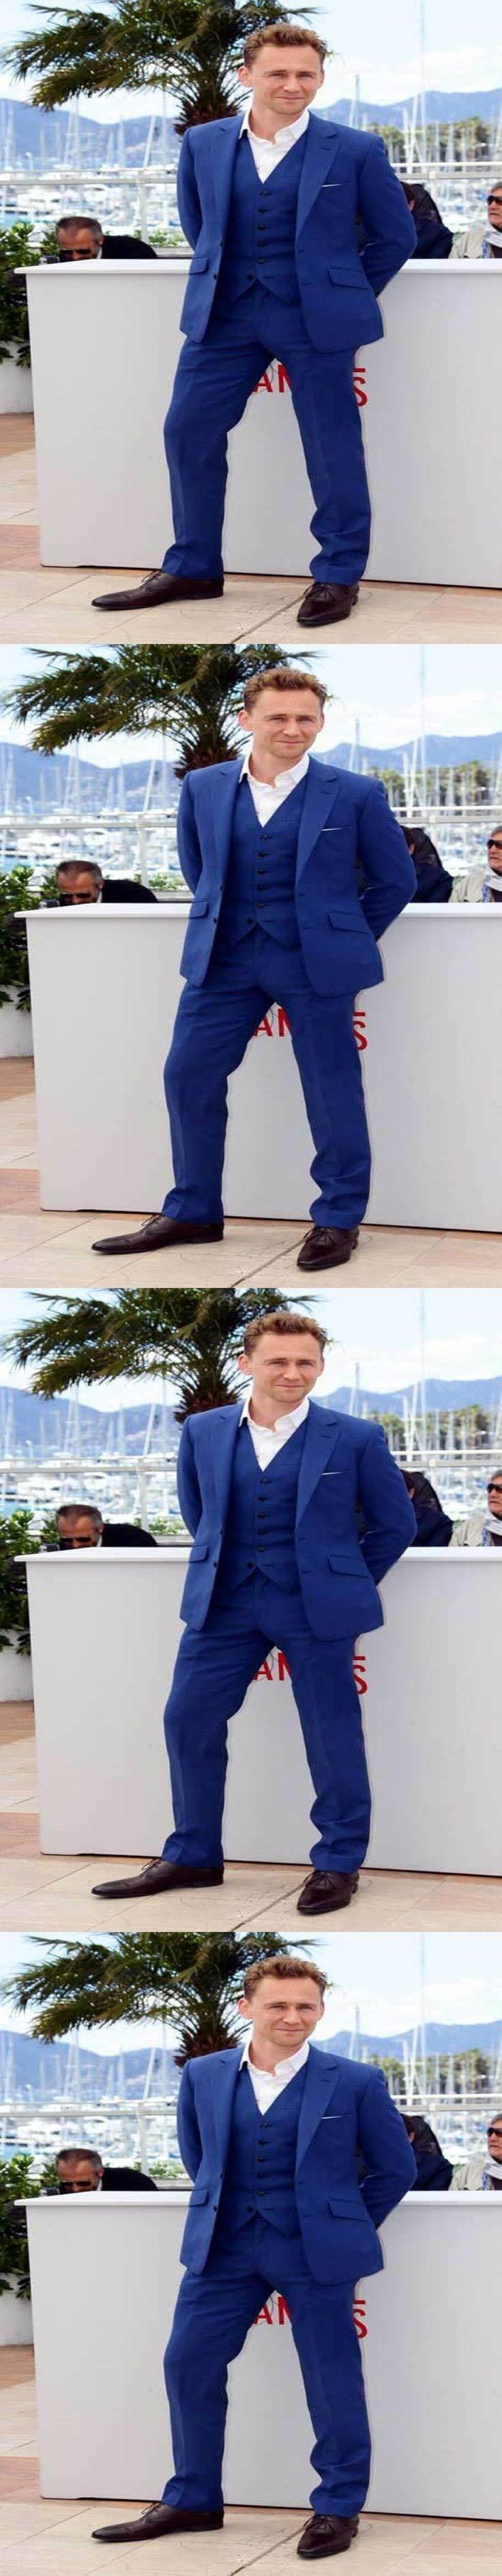 New Design Notch Collar Royal Blue Men Suits 2017 Vintage Italian Style Best Men Tuxedos For Weddings (Jacket+Pants+Vest+Tie) #menssuitsvintage